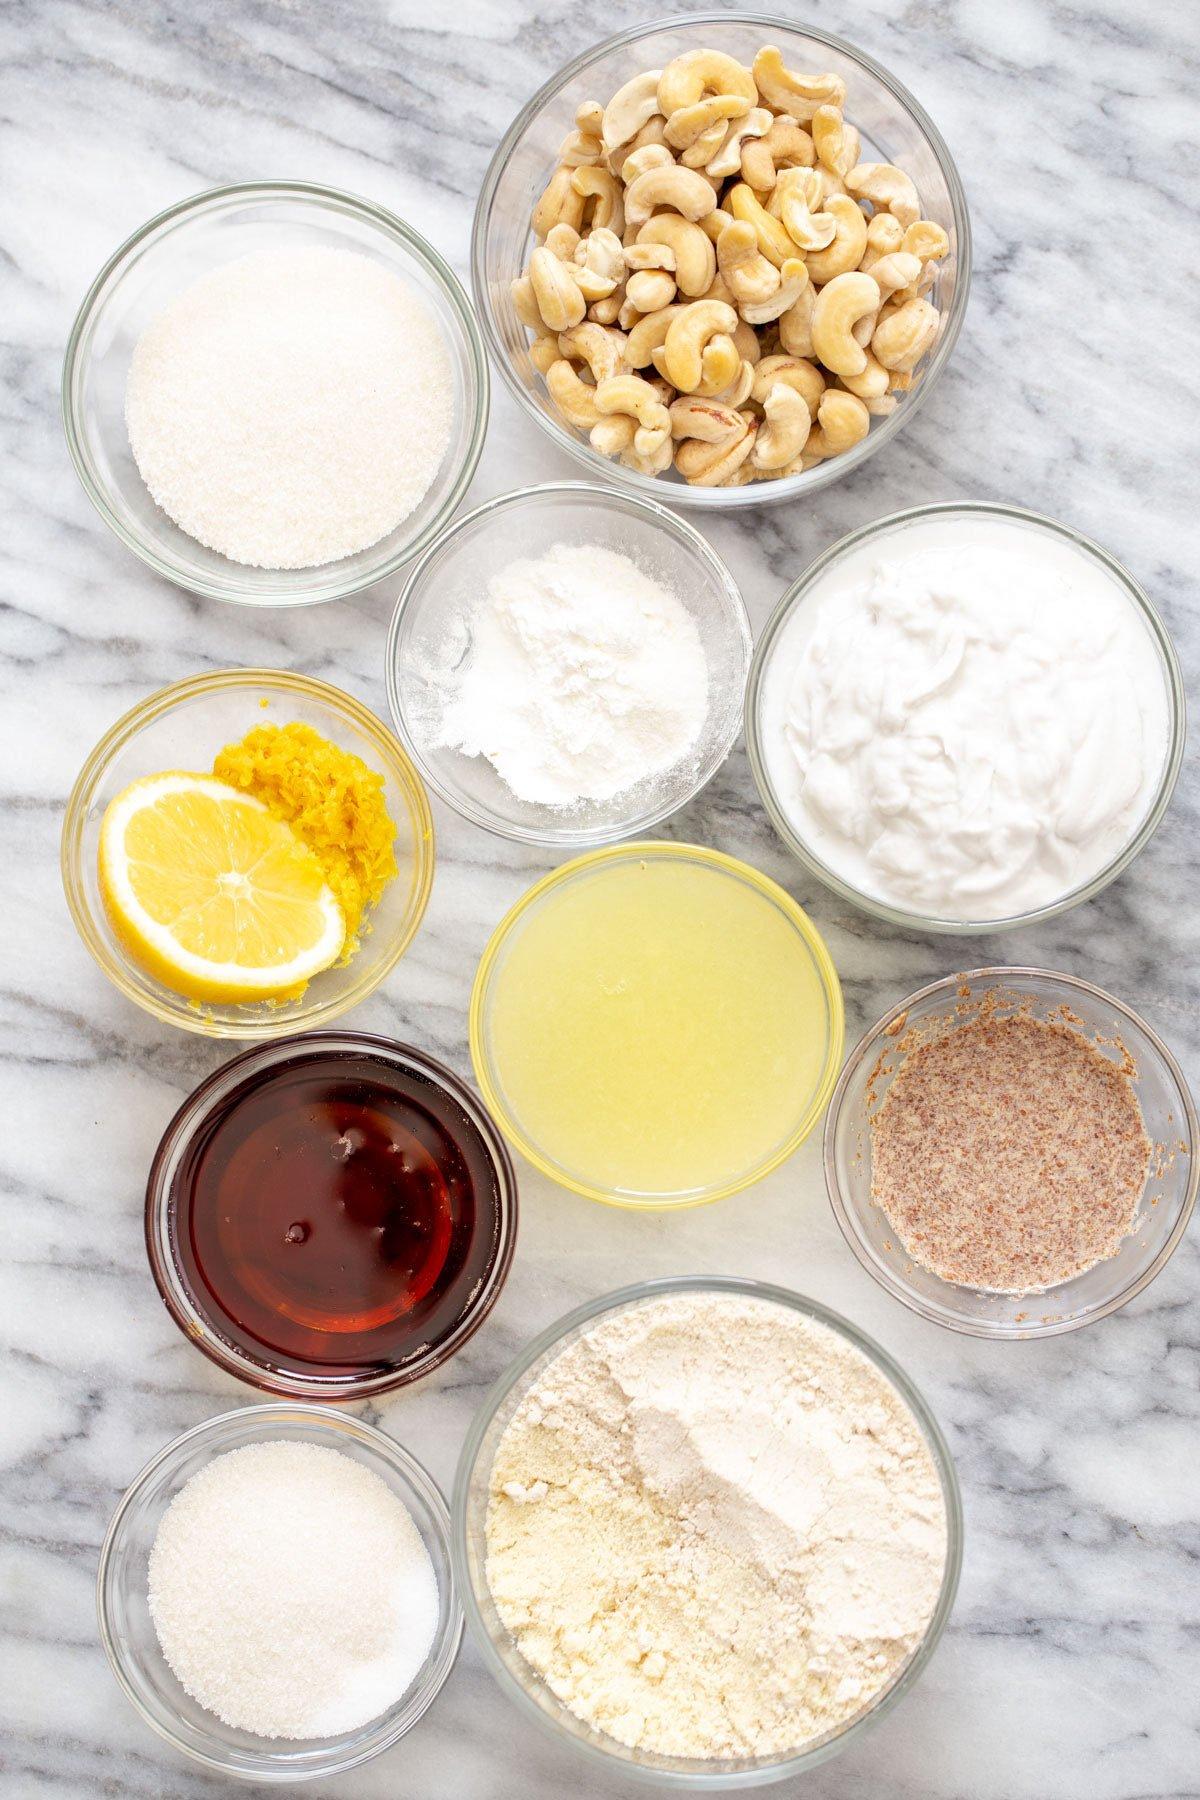 ingredients for vegan lemon bars on a marble counter